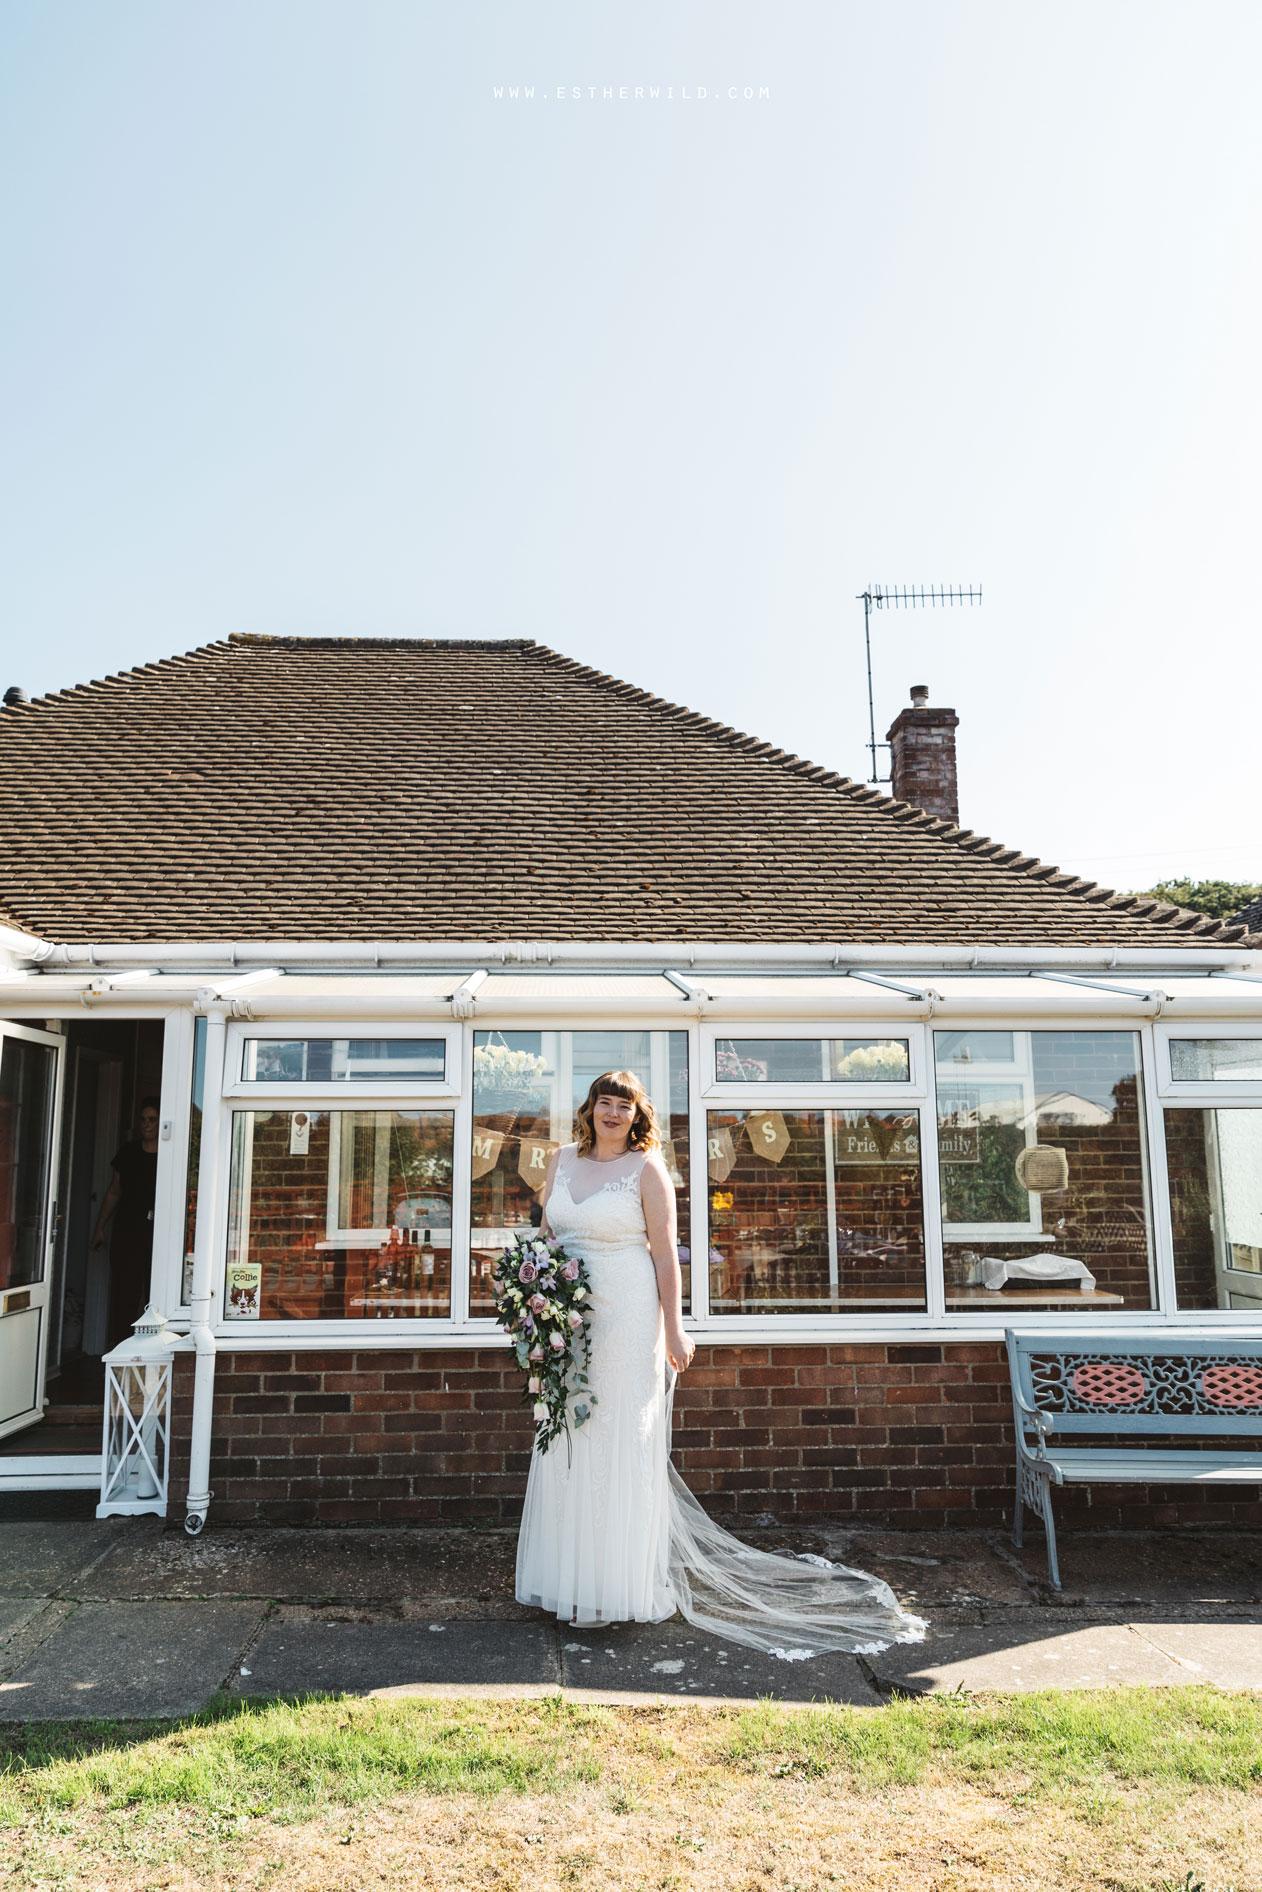 Cromer_Wedding_Beach_Outdoor_Ceremony_Norfolk_North_Lodge_Registry_Office_Rocket_House_Cafe_Cromer_Pier_IMG_3507.jpg